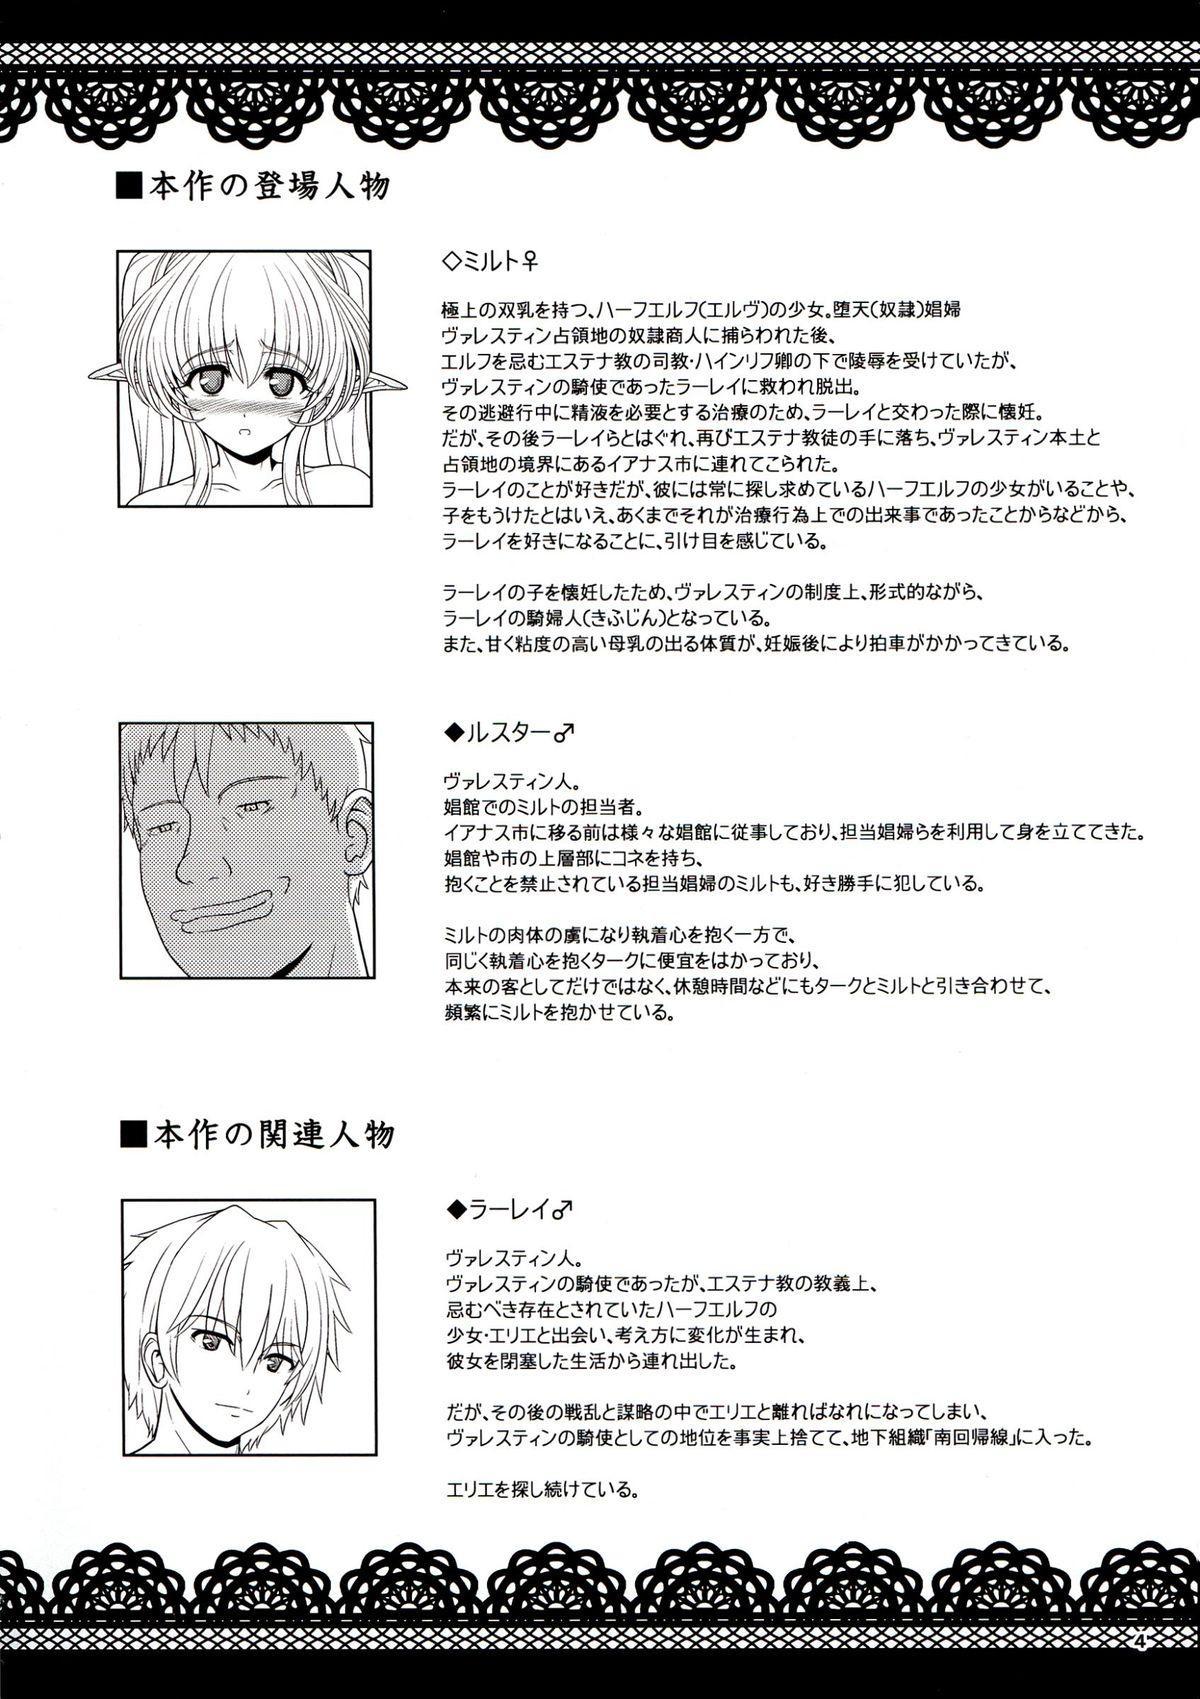 El toiu Shoujo no Monogatari X1 4